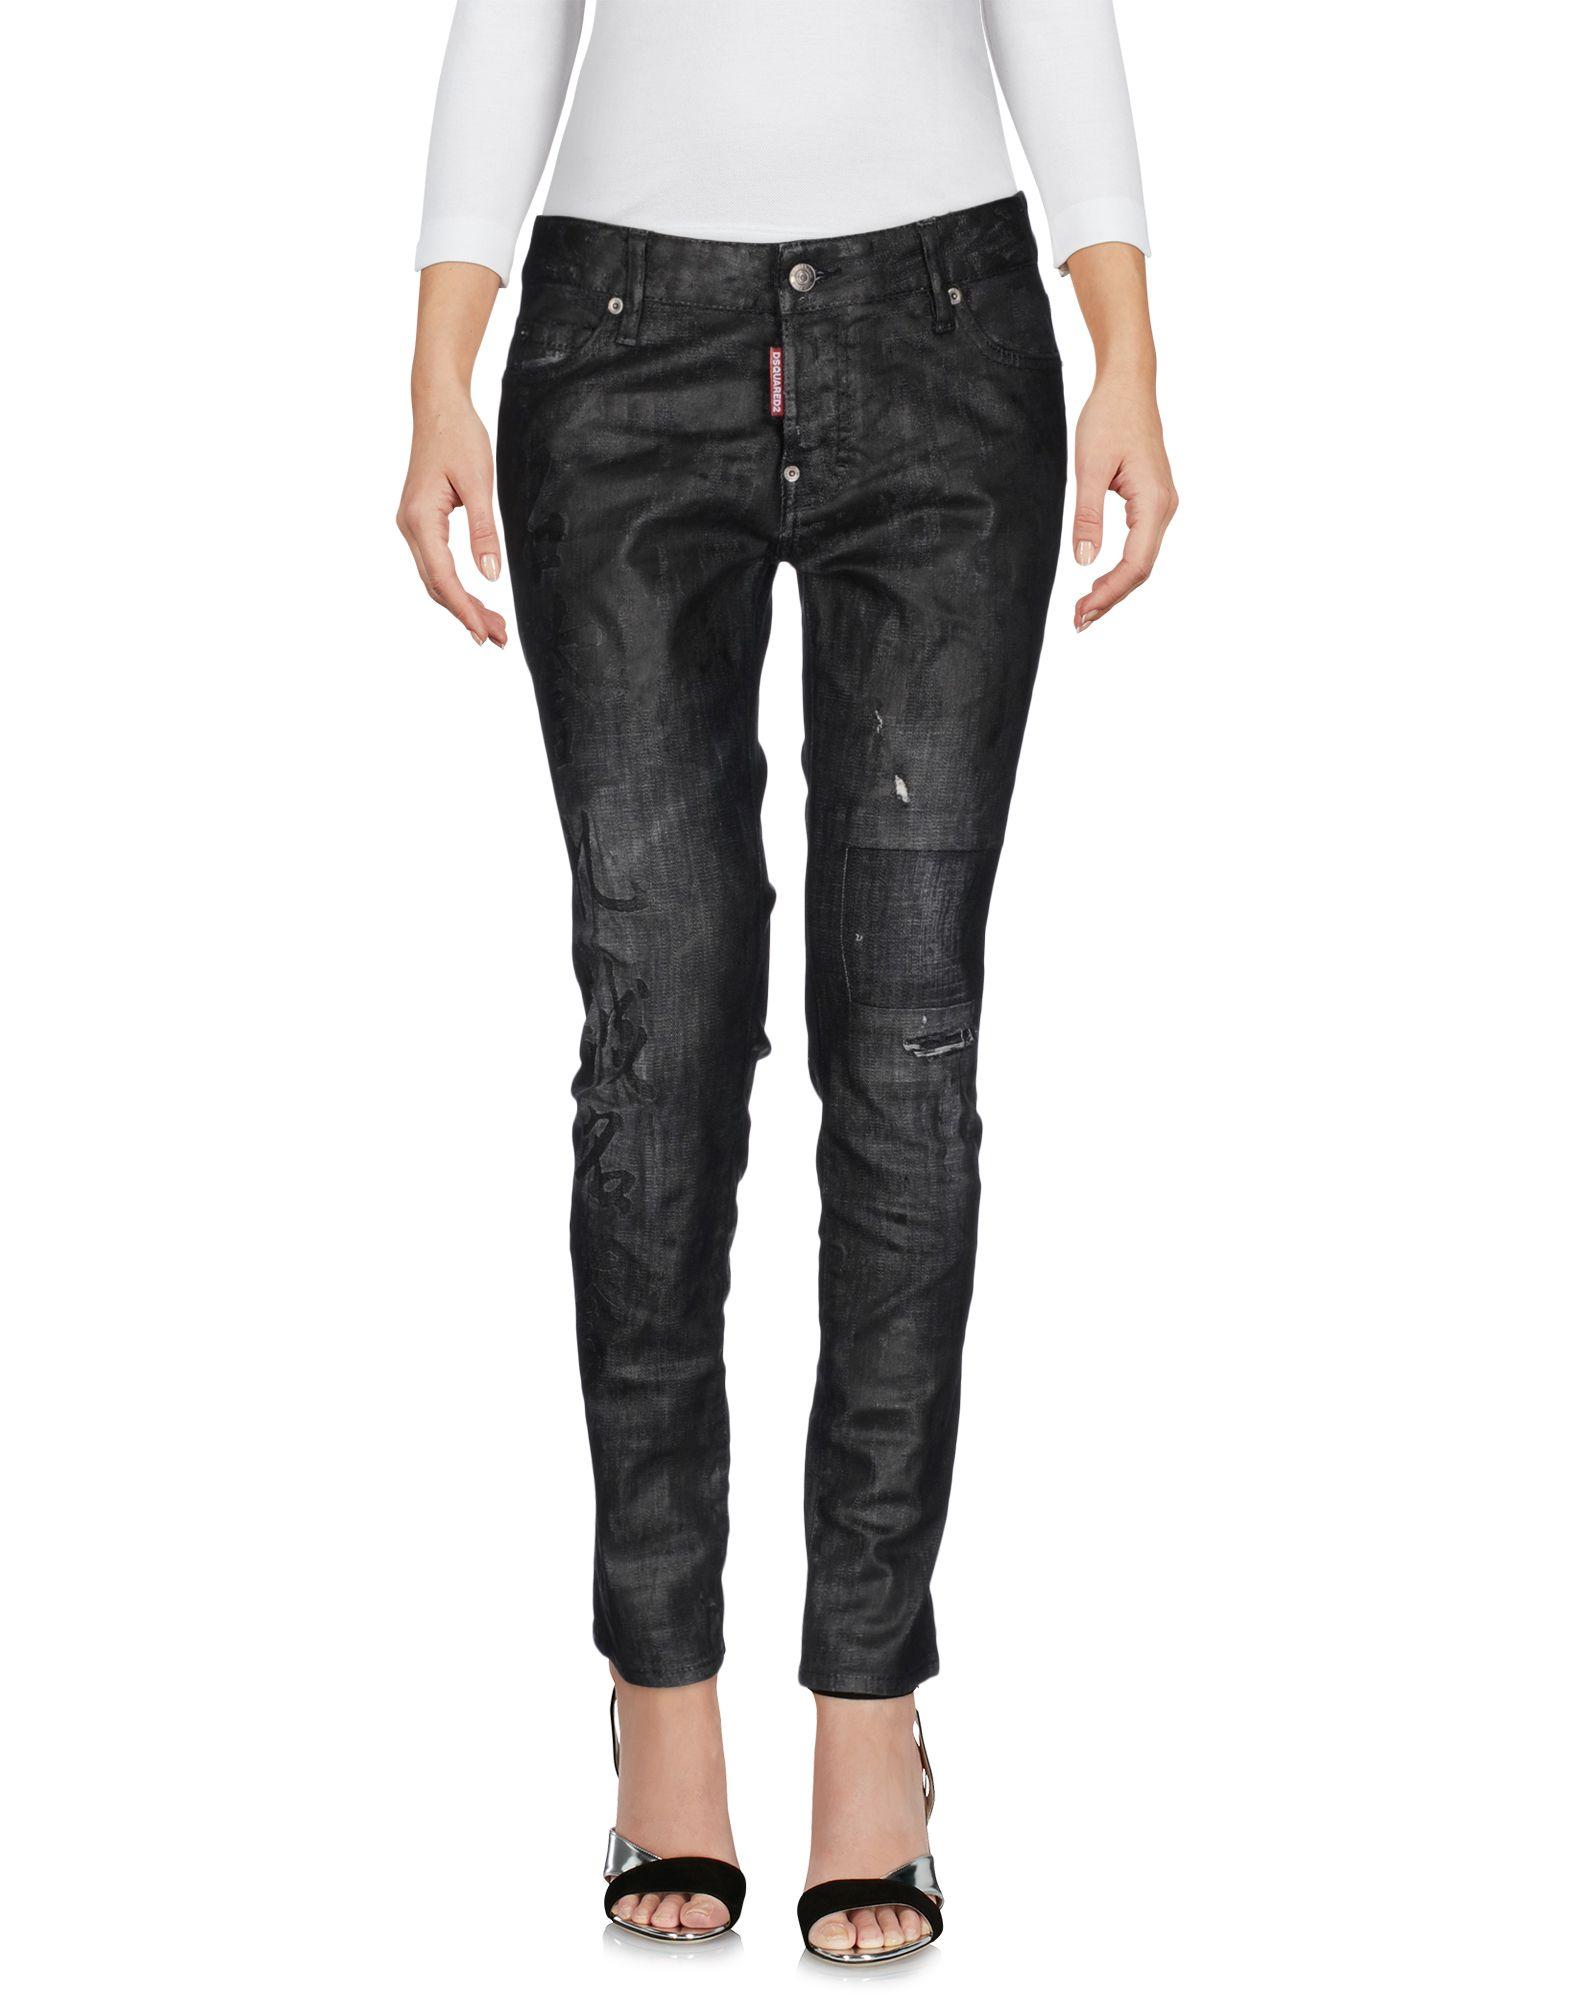 Pantaloni Jeans Dsquared2 Donna - Acquista online su evQGhb6t